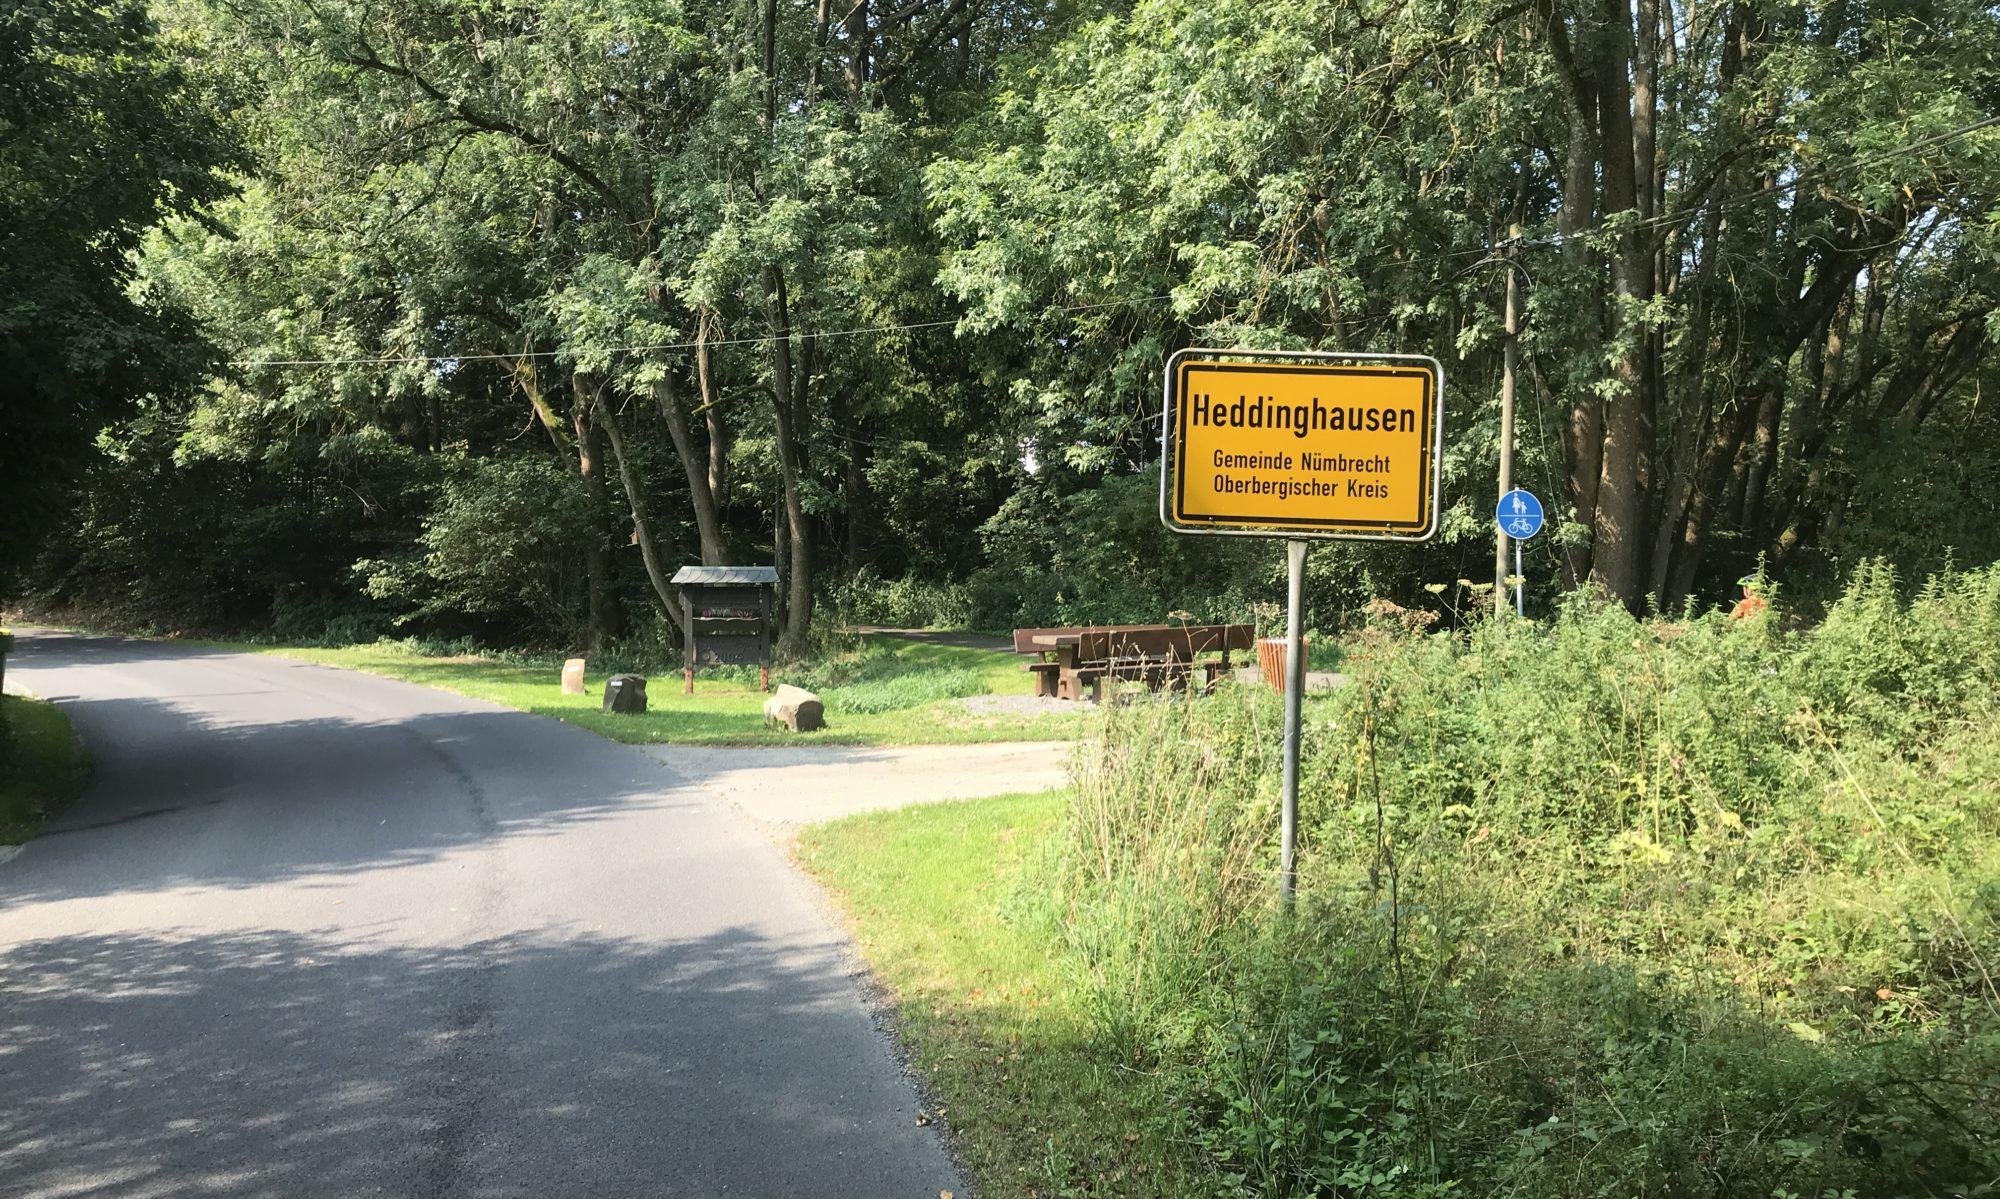 Gemeinnütziger Verein Heddinghausen e.V.